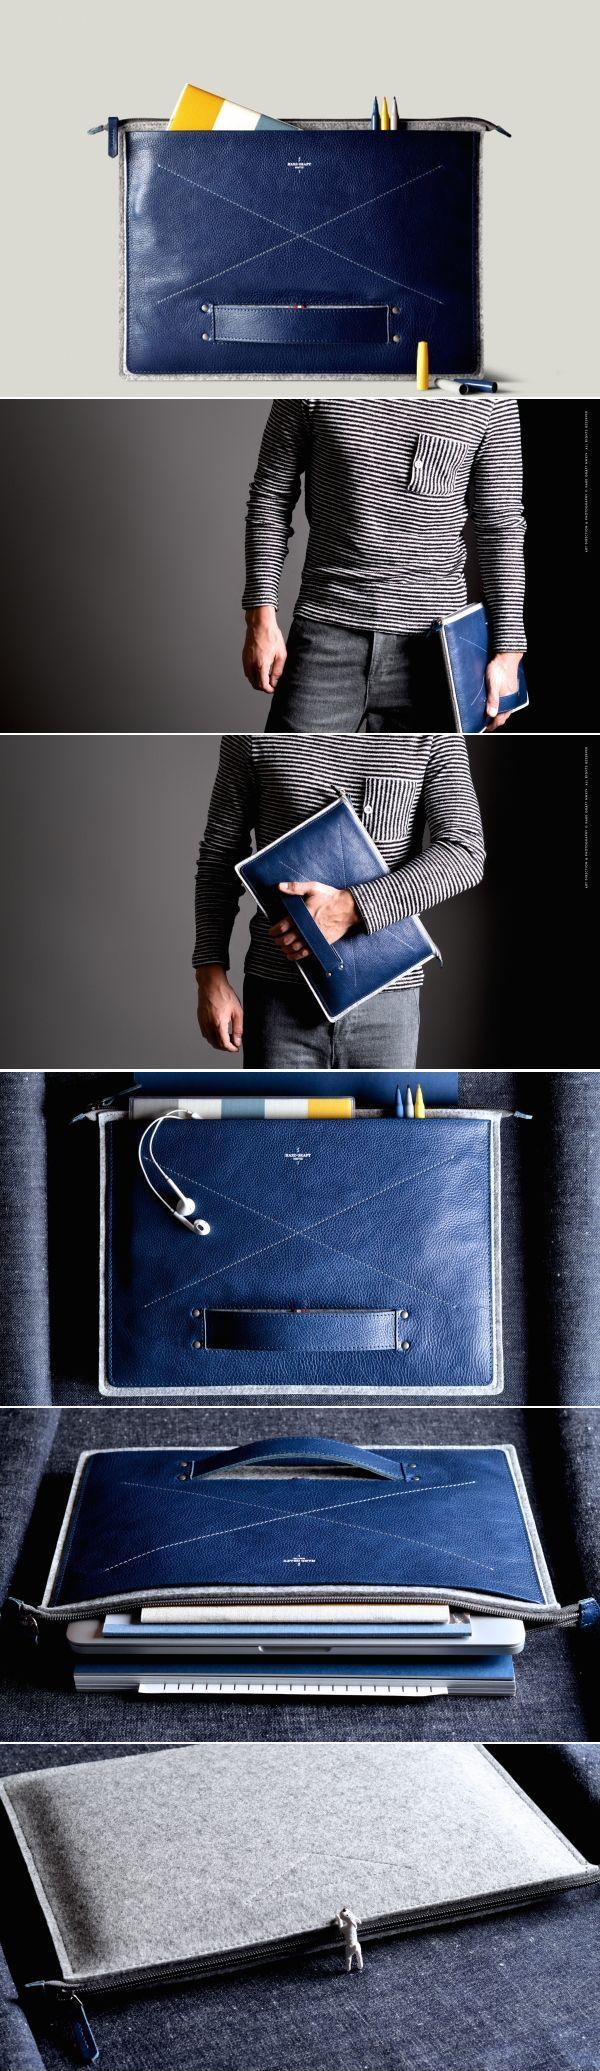 #hardgraft Grab Laptop Folio / Ocean - cute bags online, bags womens, bags online shop *sponsored https://www.pinterest.com/bags_bag/ https://www.pinterest.com/explore/bags/ https://www.pinterest.com/bags_bag/luxury-bags/ http://www.6pm.com/bags